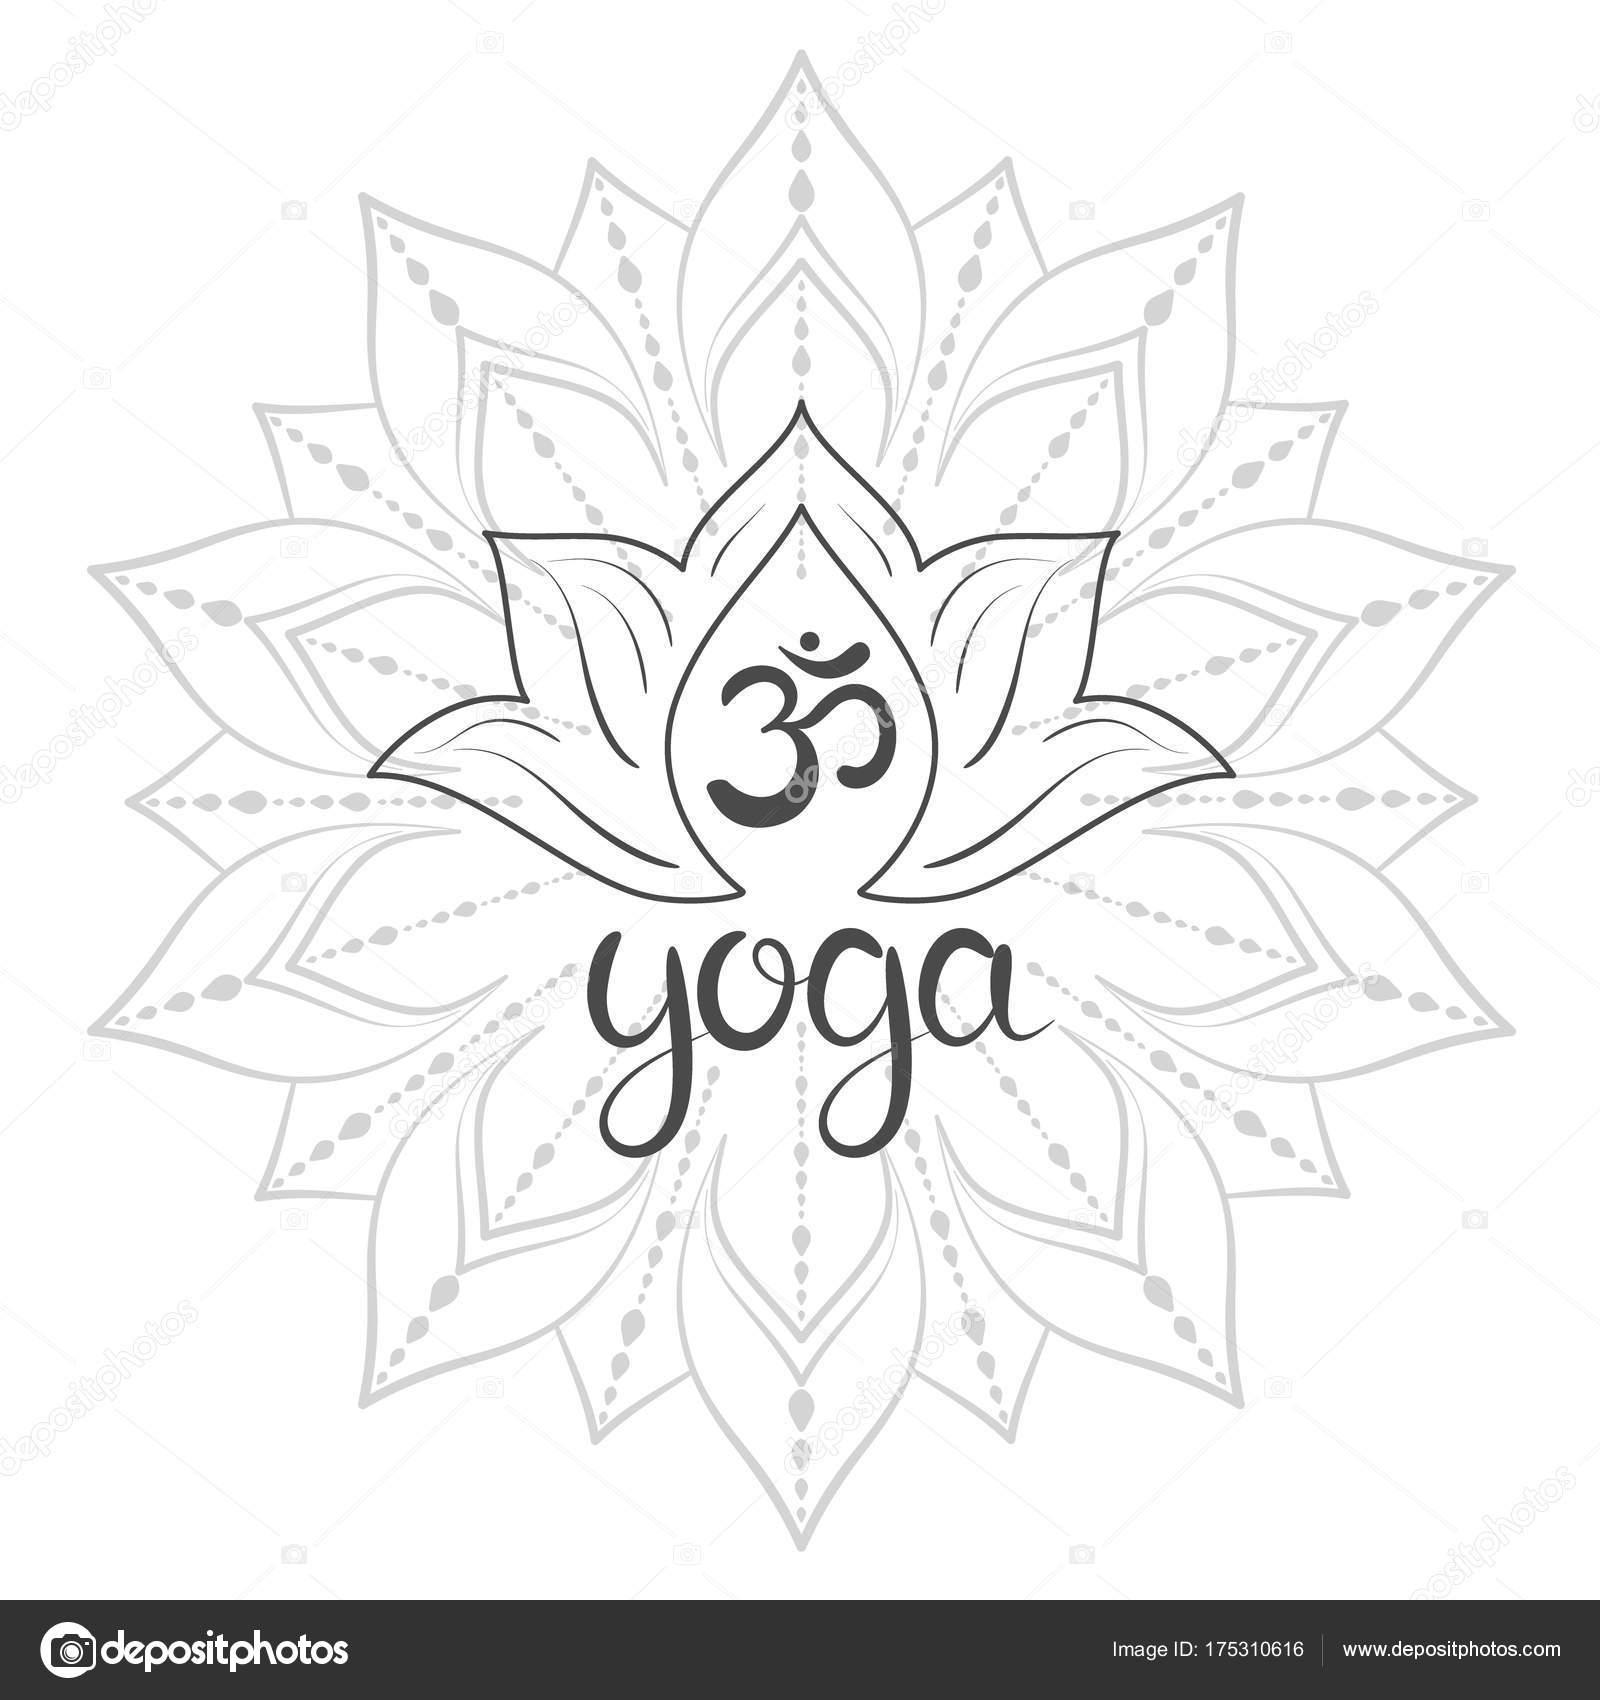 Symbol hand drawn mandala lotus flower yoga lettering set oriental om symbol with hand drawn mandala lotus flower yoga lettering set of oriental ornaments for greeting card invitation yoga poster coloring book mightylinksfo